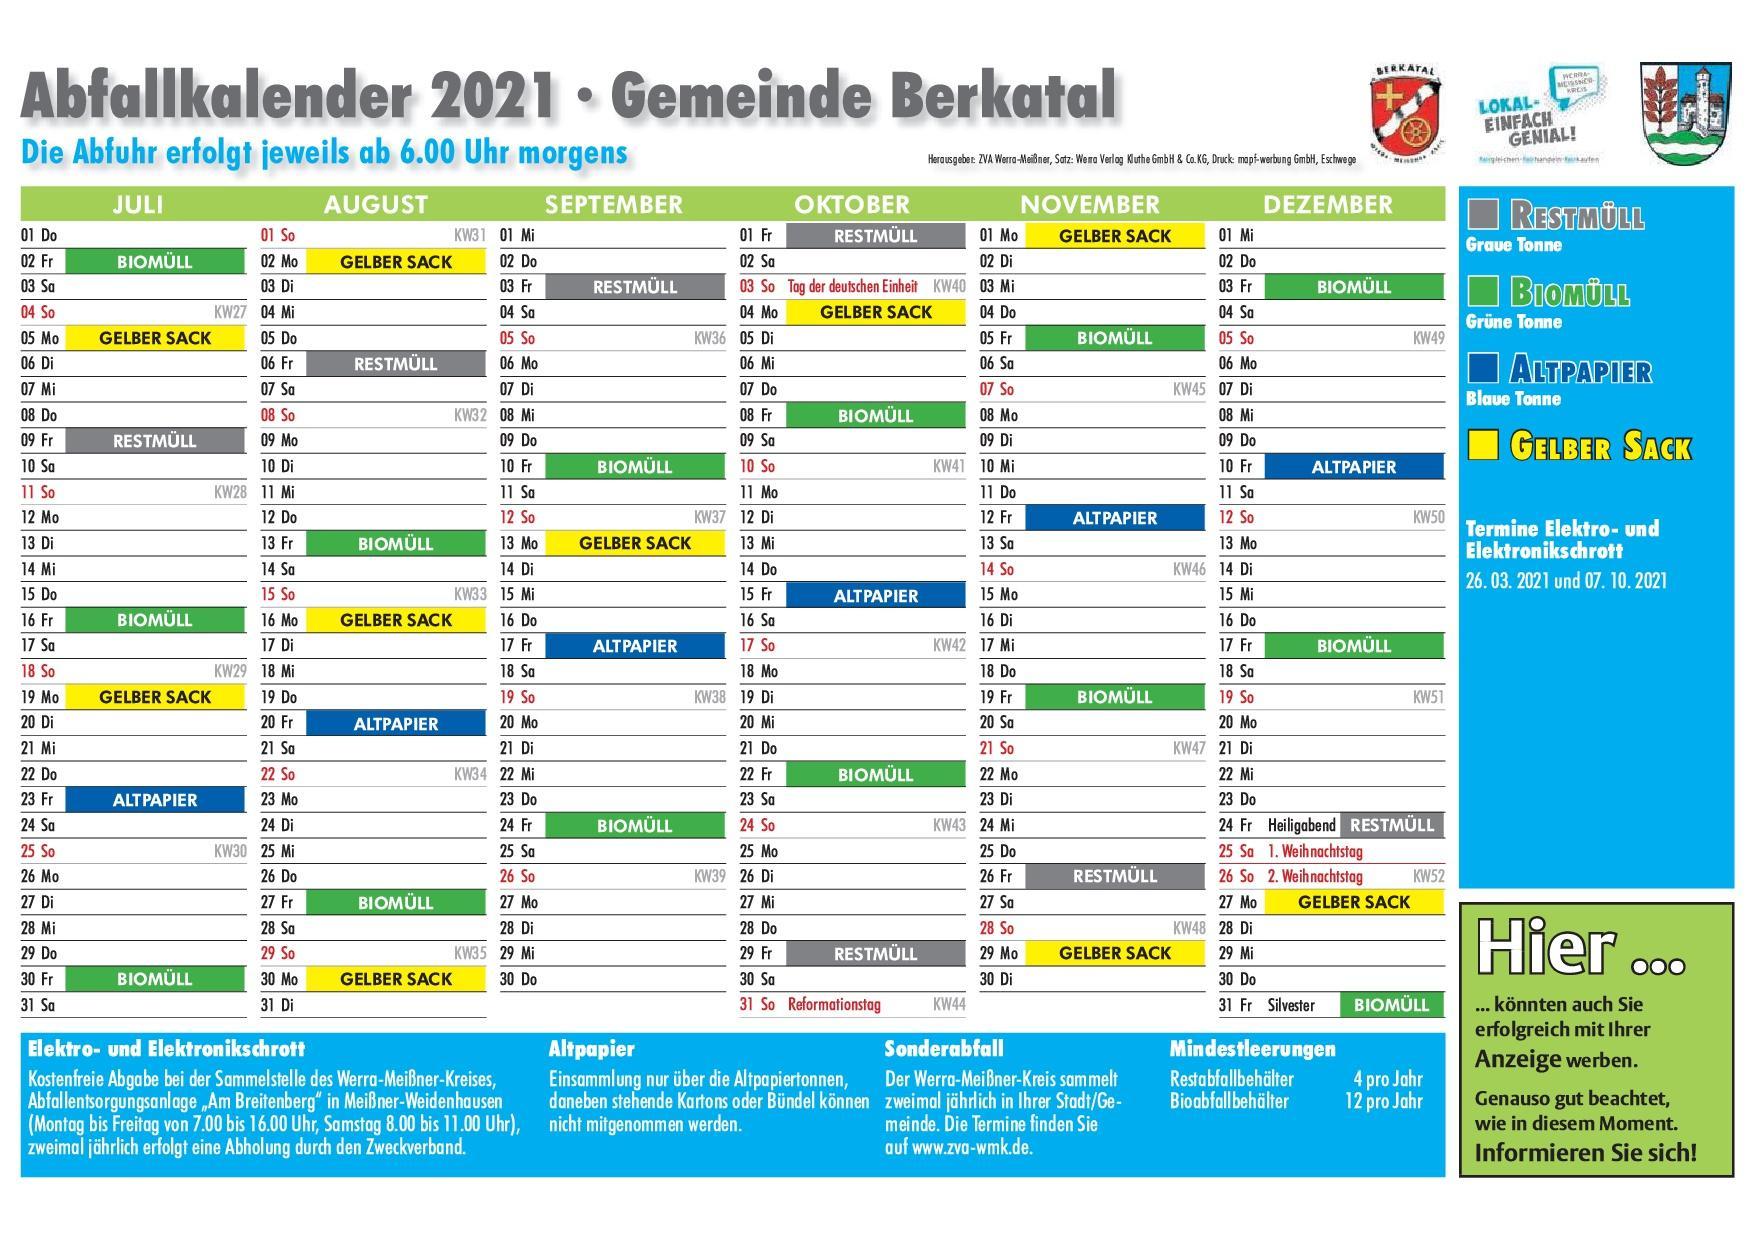 Abfallkalender 2021 2. HJ